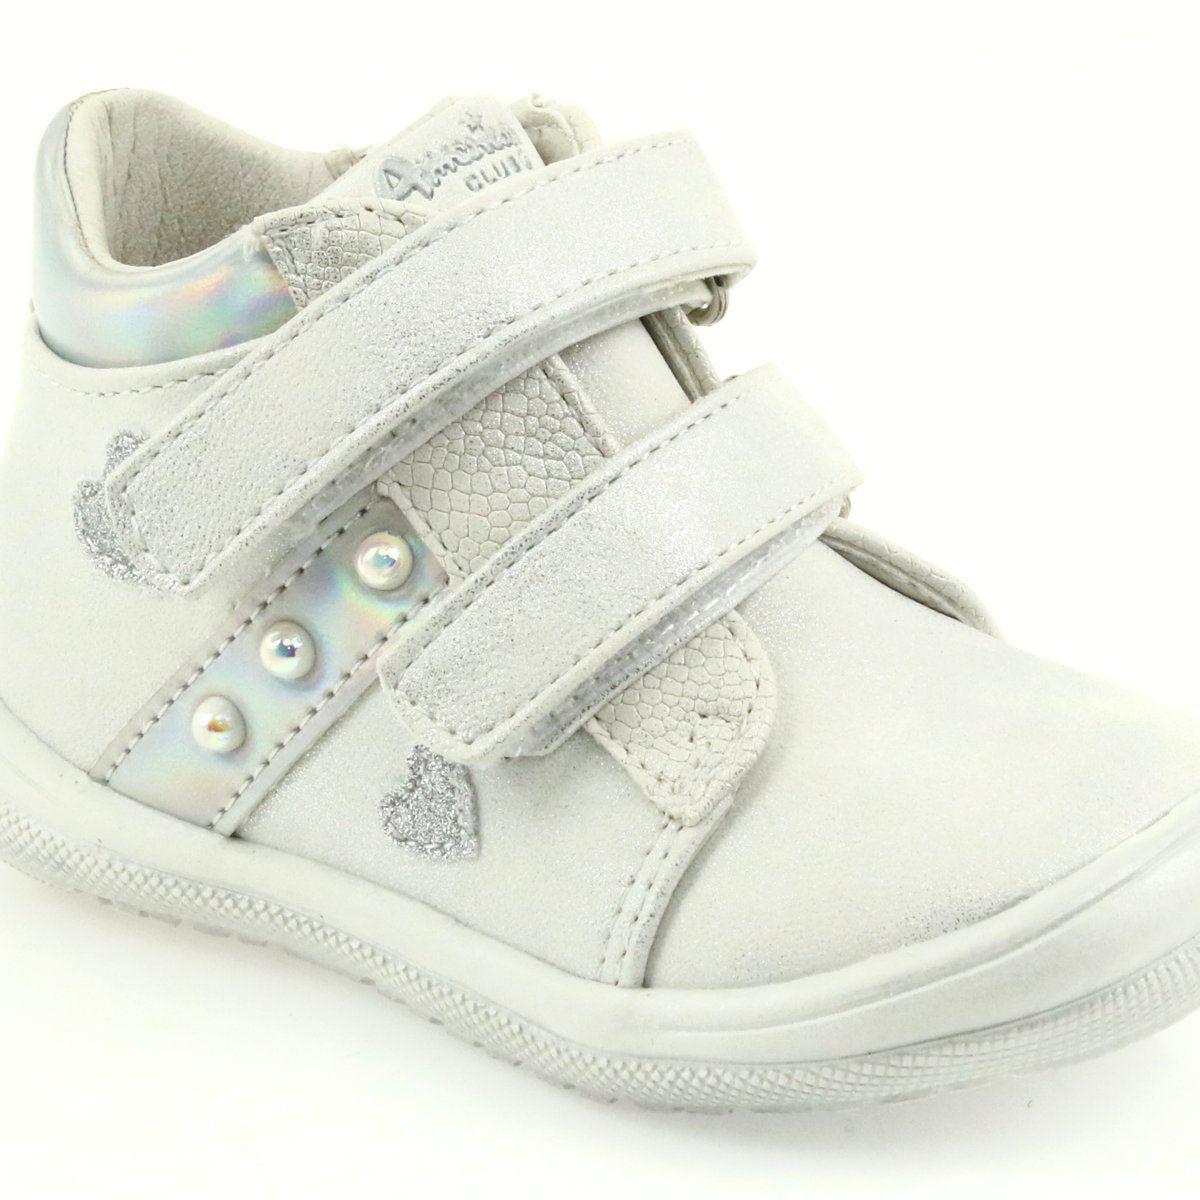 American Club Adi Sportowe Buty Dziciece W Serduszka American Biale Szare Wedge Sneaker Shoes Sneakers